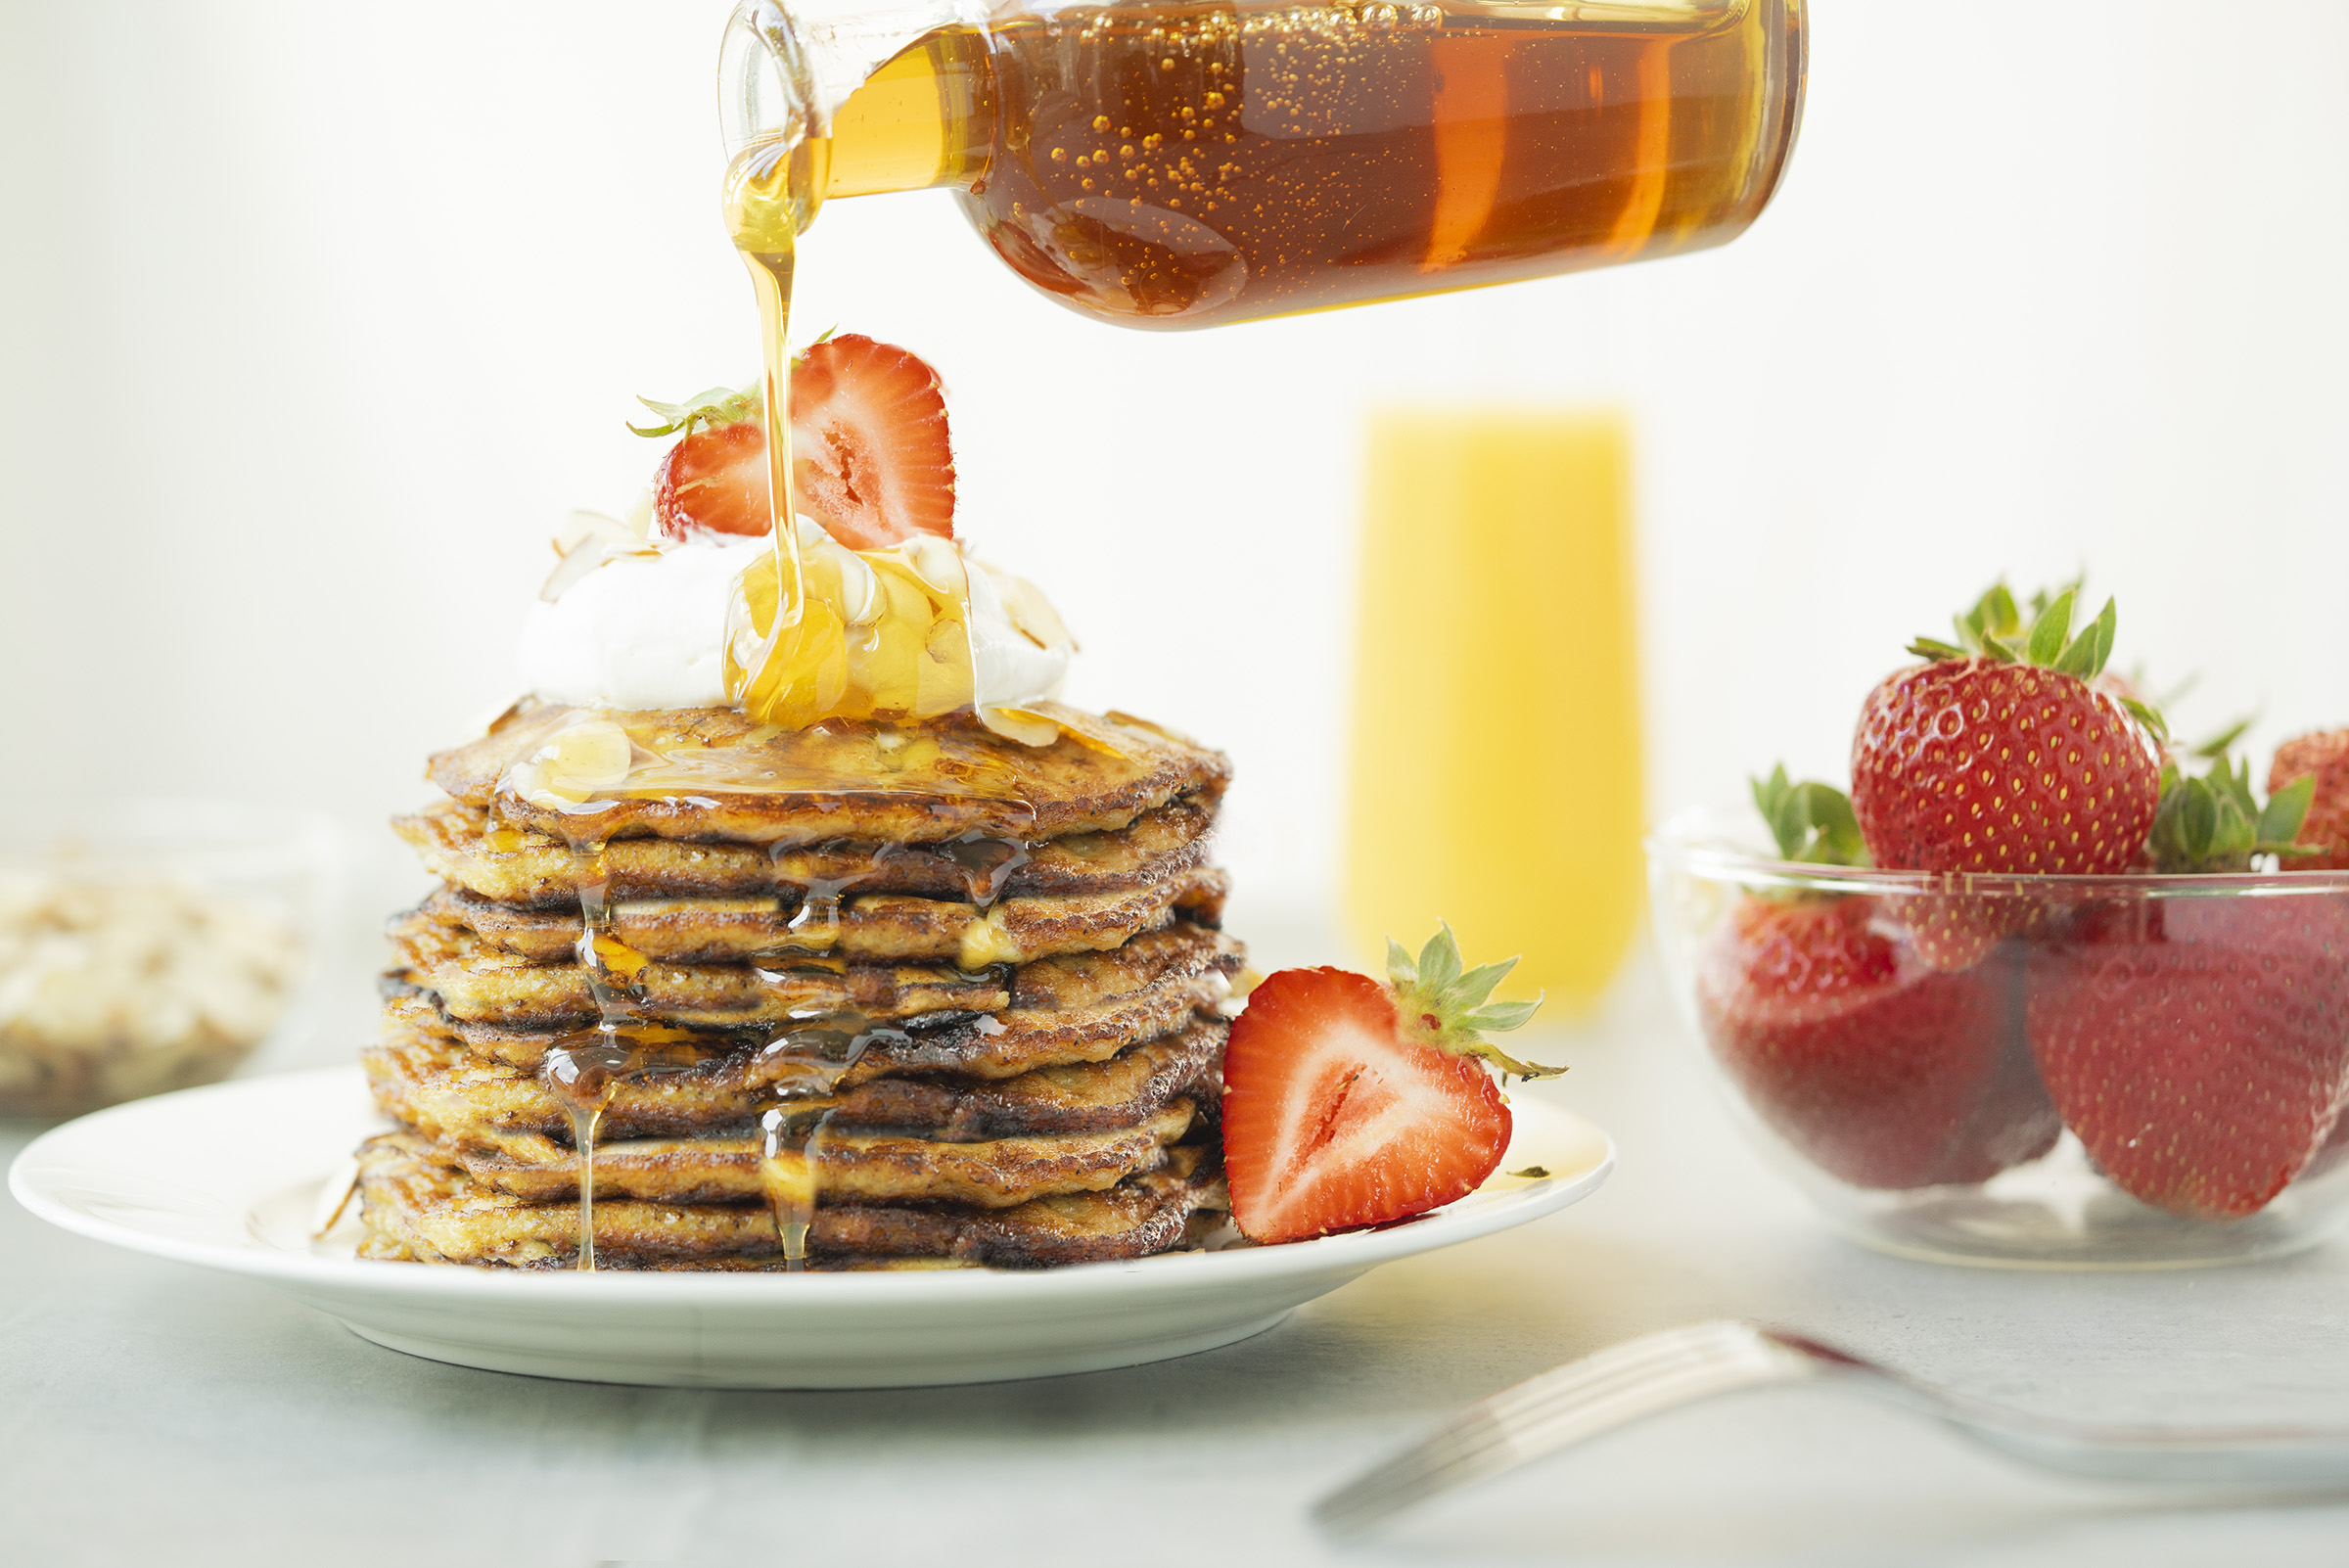 Sweet & Moist Low-Carb Banana Pancakes